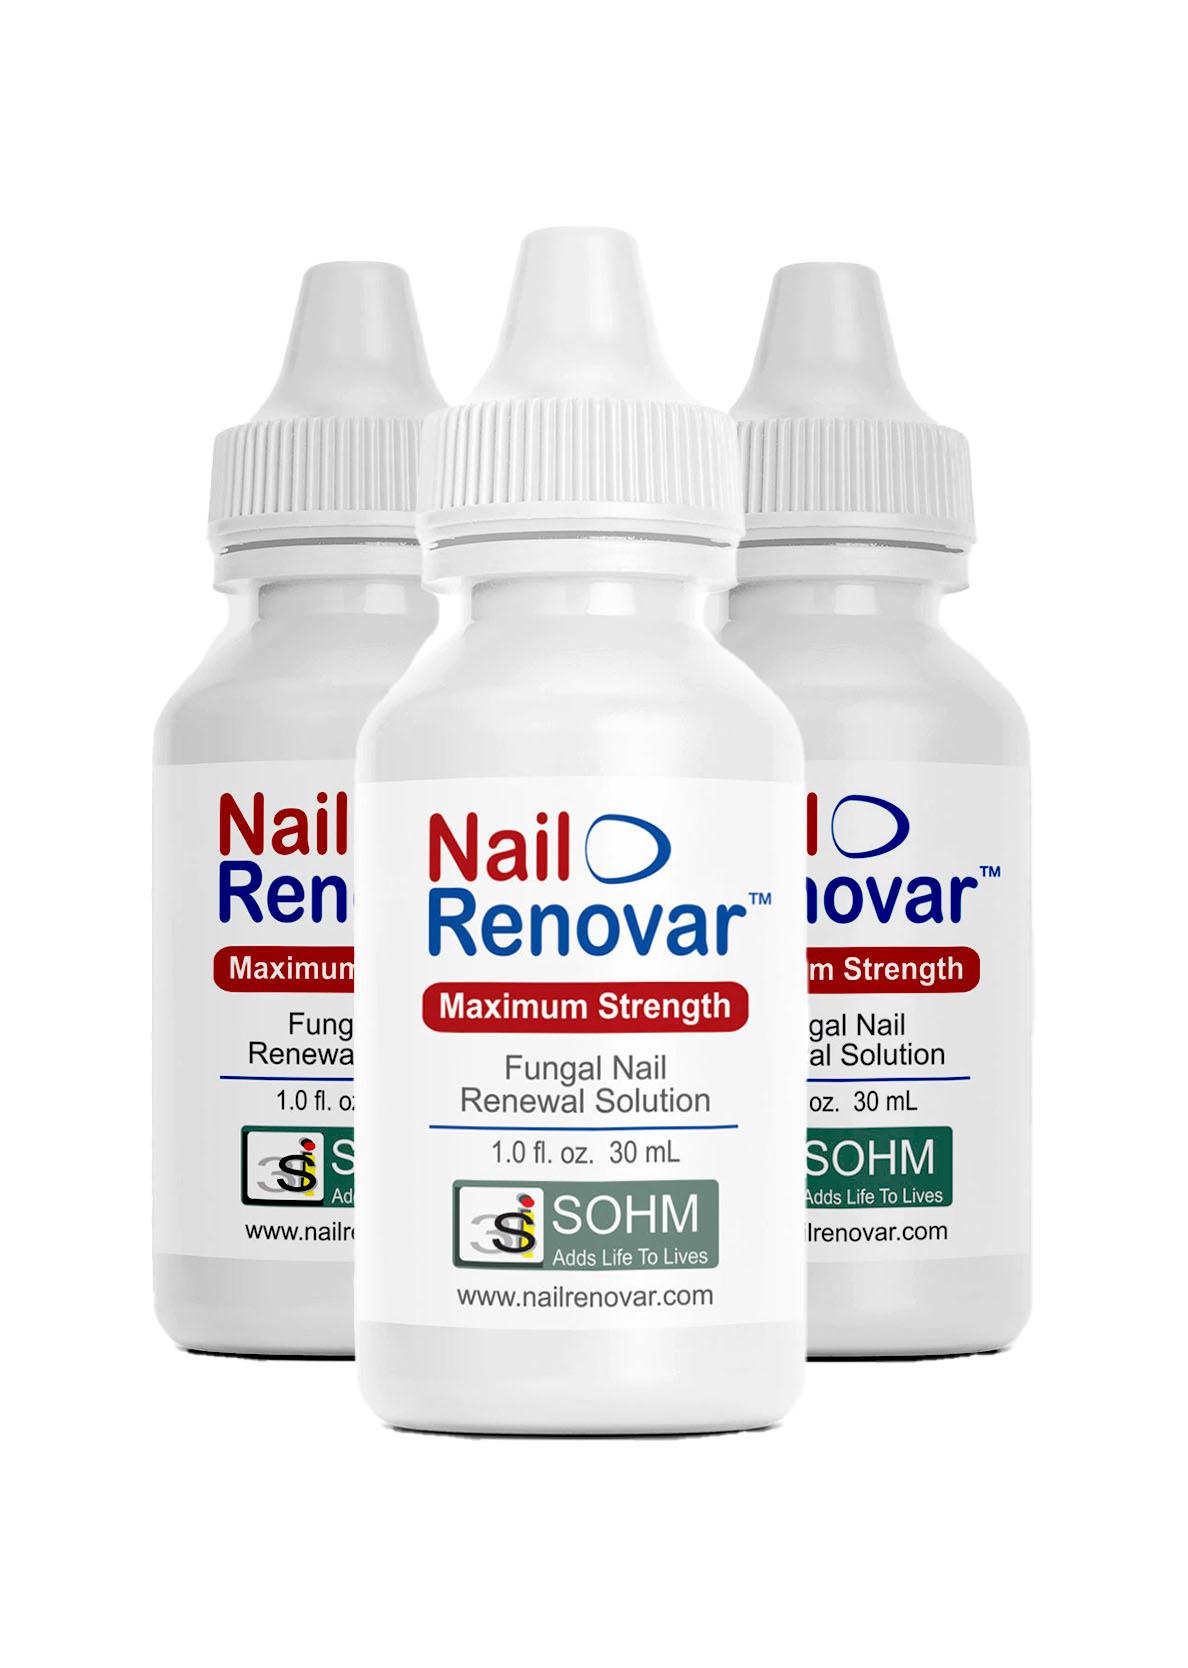 Nail Renovar Three Pack